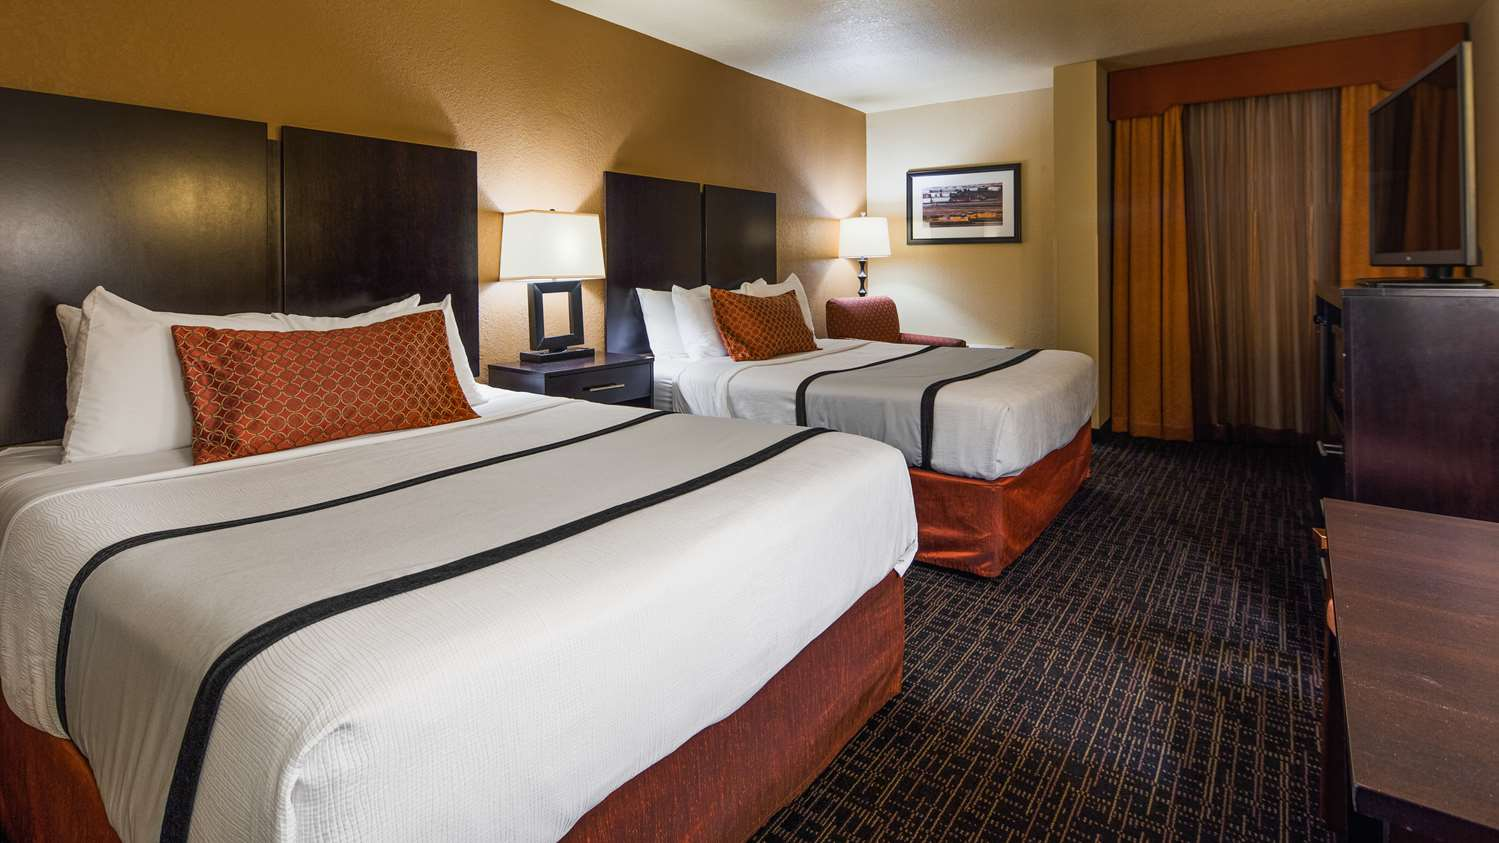 Best Western Plus North Platte Hotel, NE - See Discounts